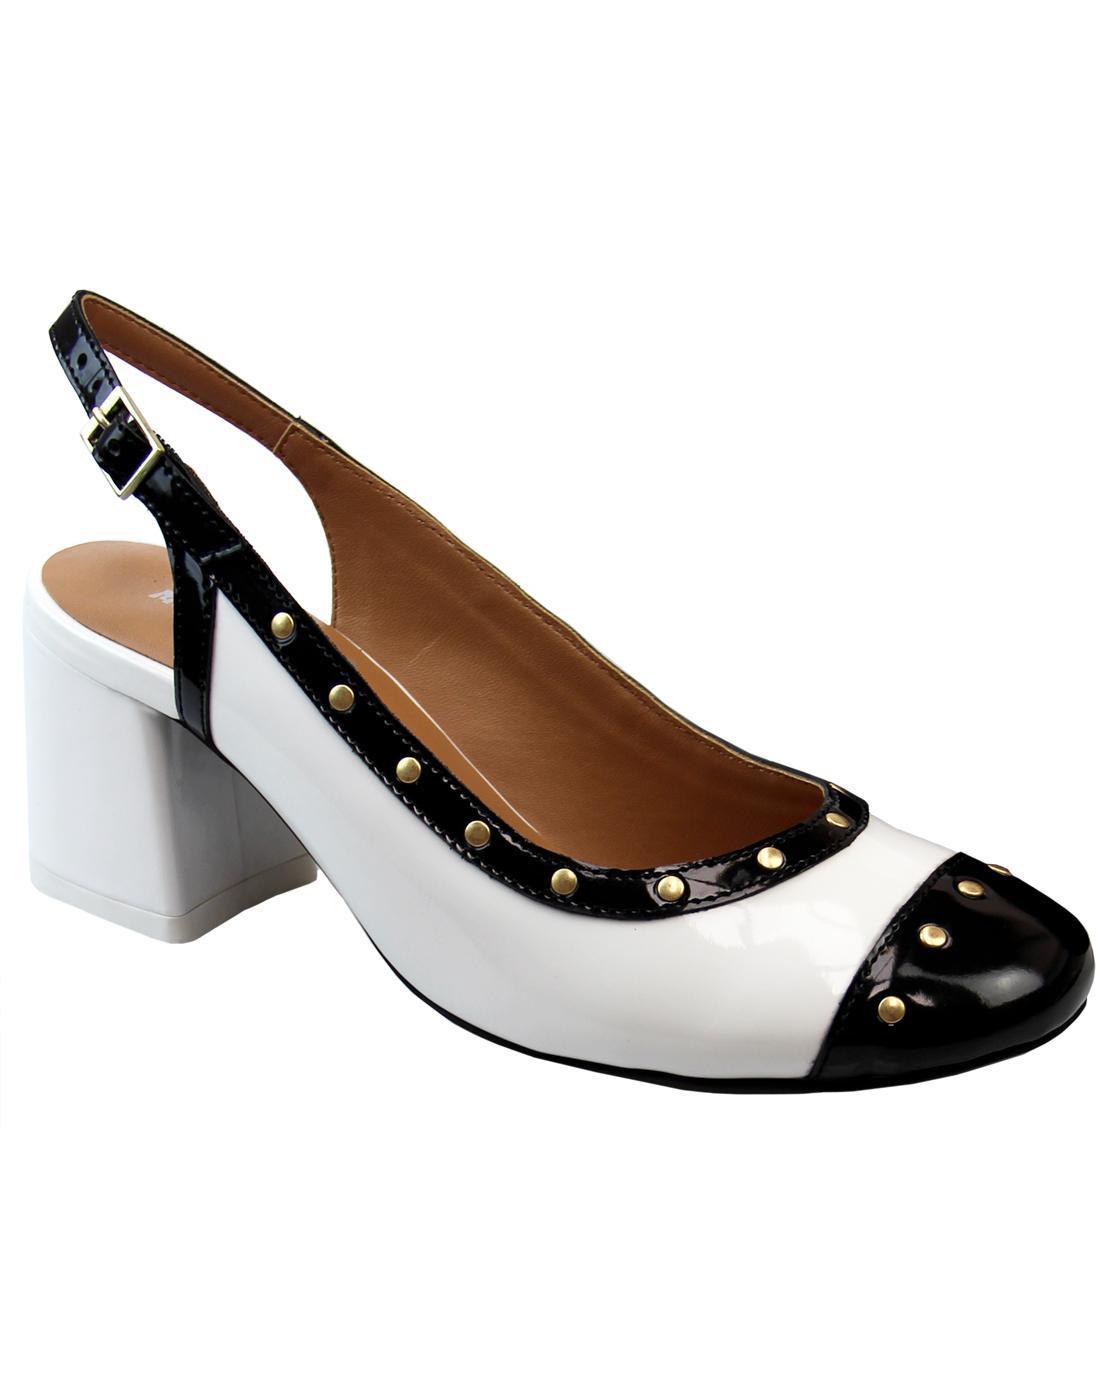 Marisol MADCAP ENGLAND 60s Mod Slingback Heels